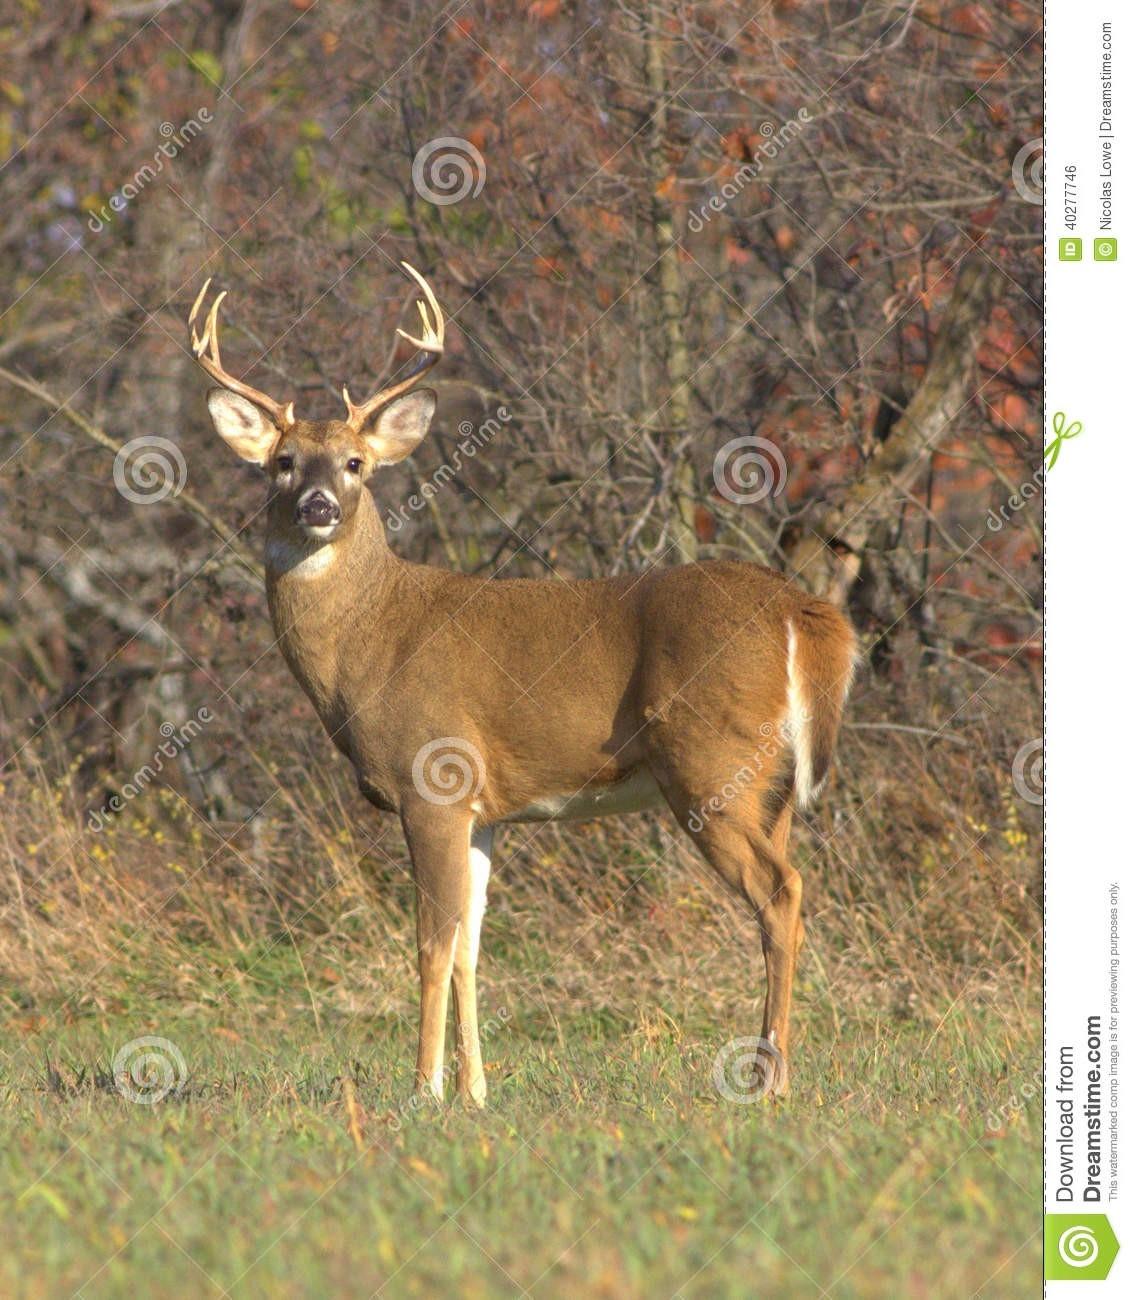 White-Tailed Deer Stock Photo. Image Of Artiodactyla - 40277746  North Kansas Deer Rut Season